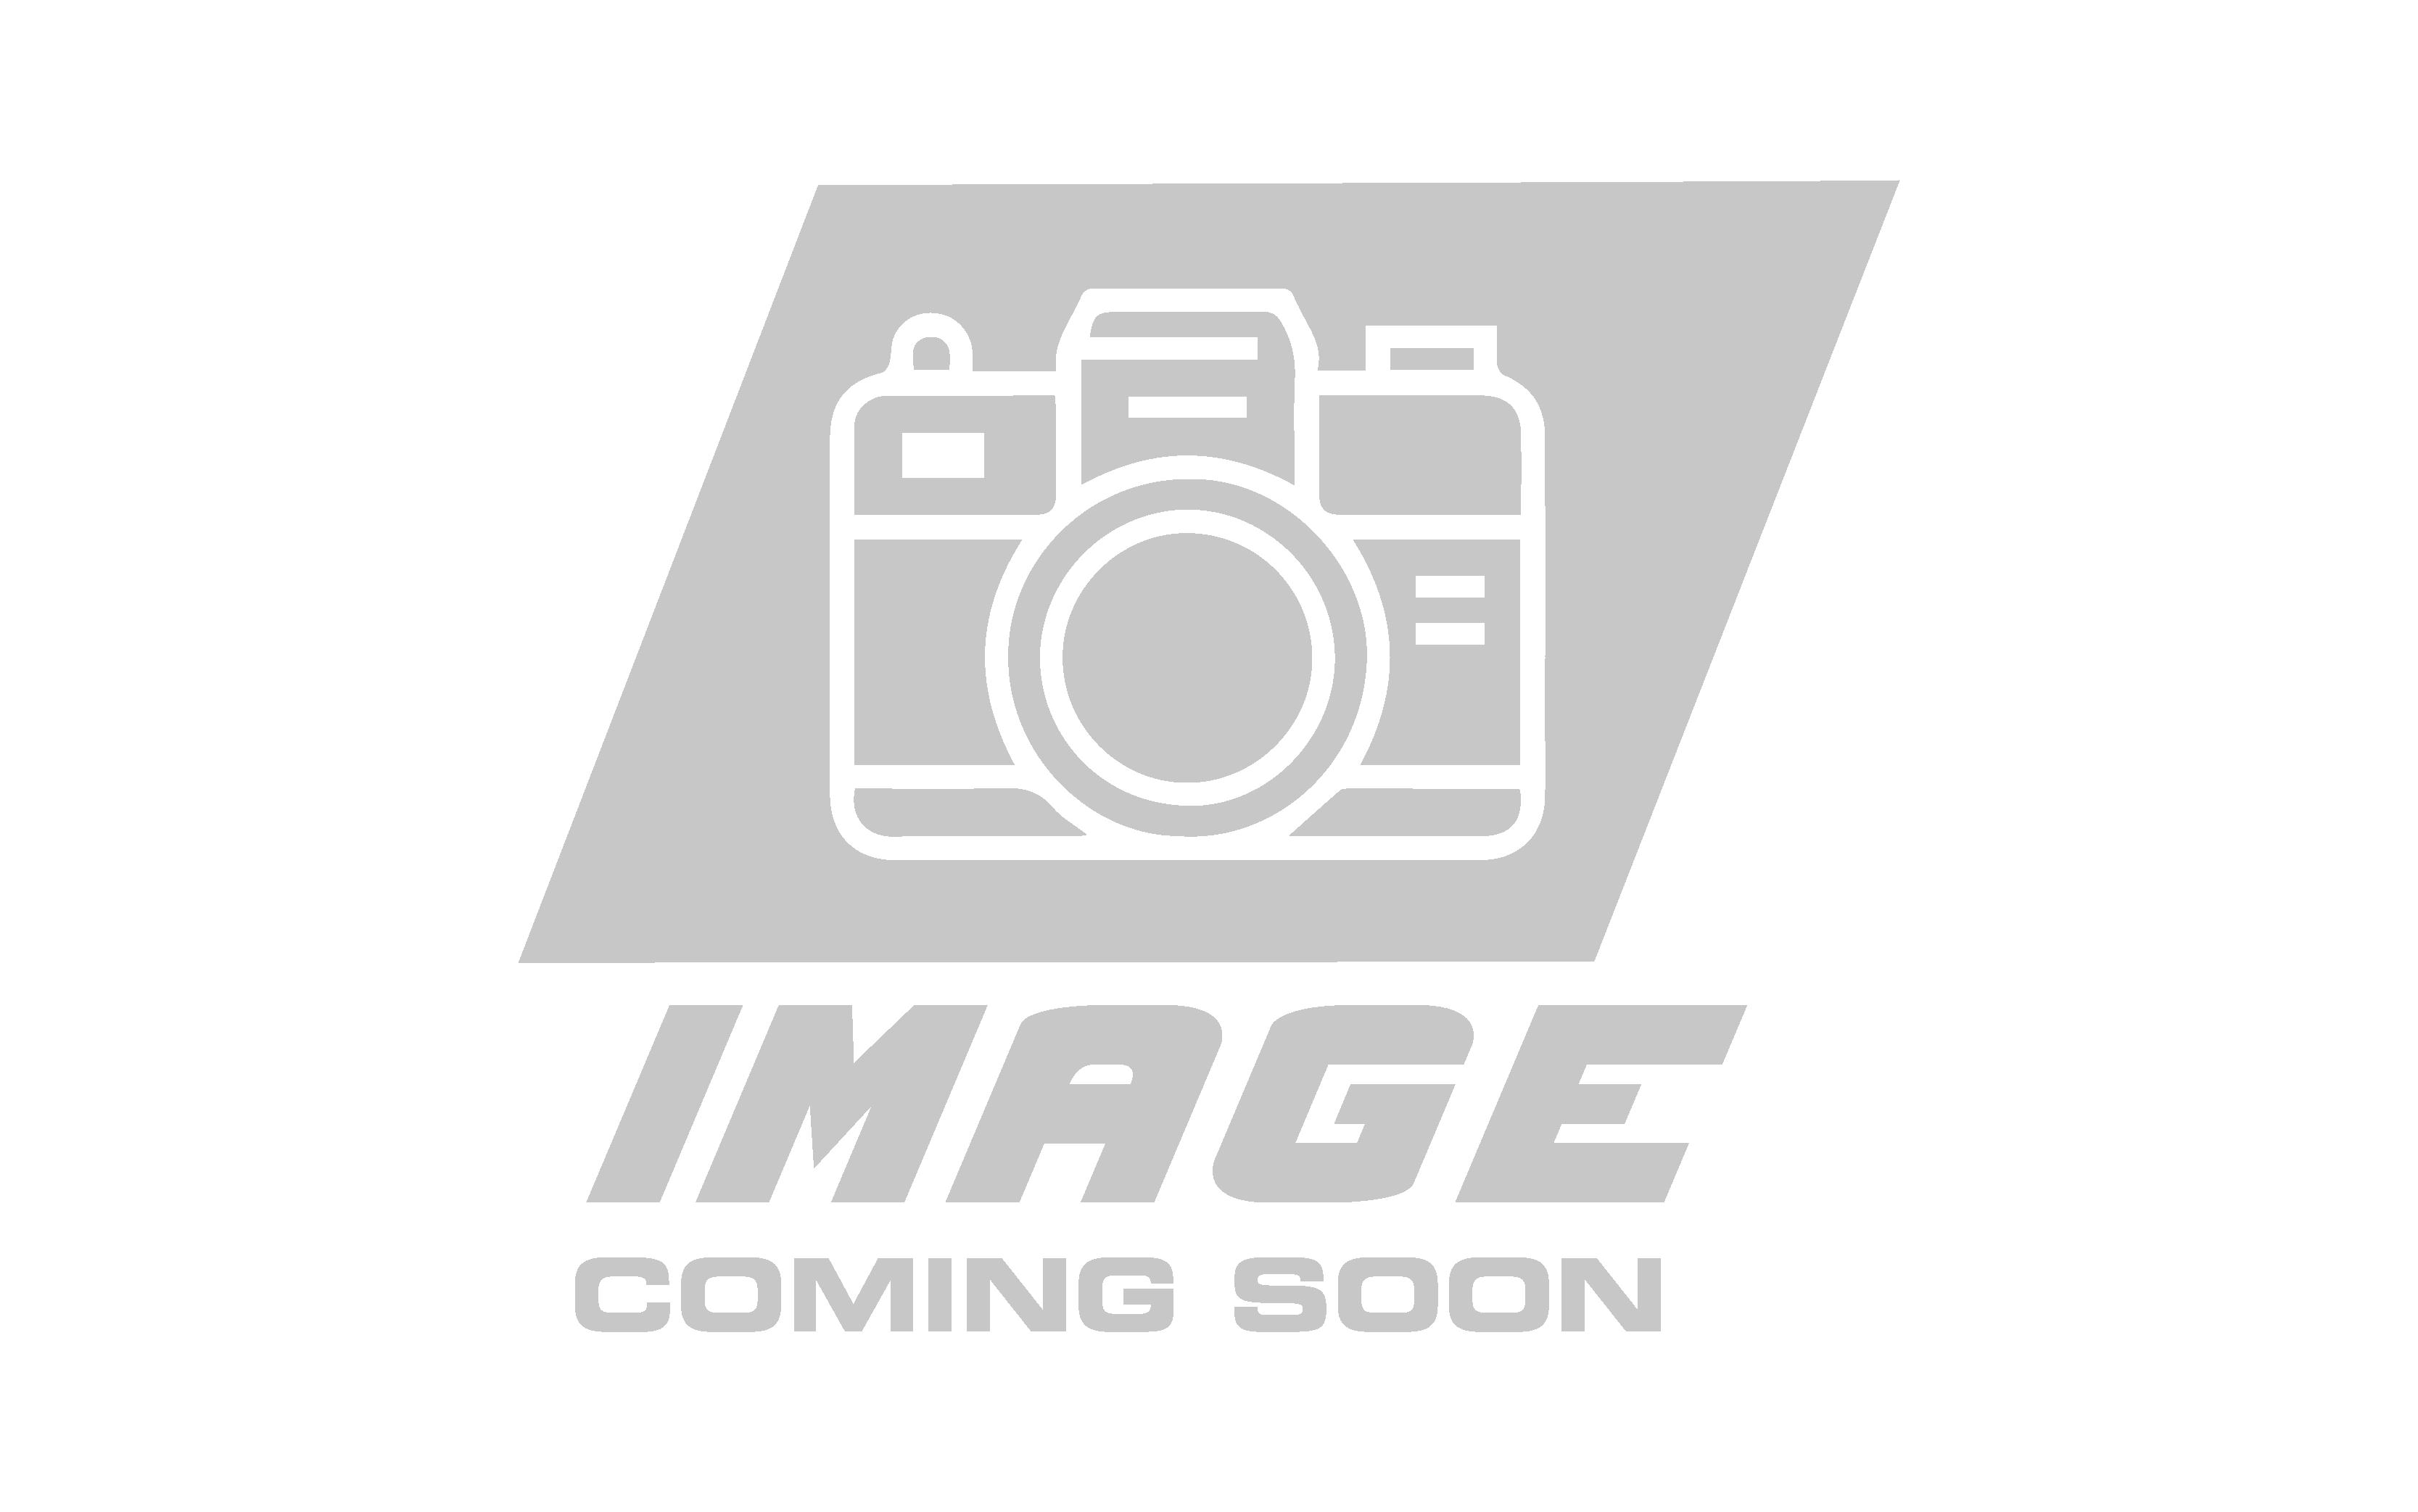 dodge_ram_2500_3500_air_lift_loadlifter_5000_ultimate_bag_not_actual_88297